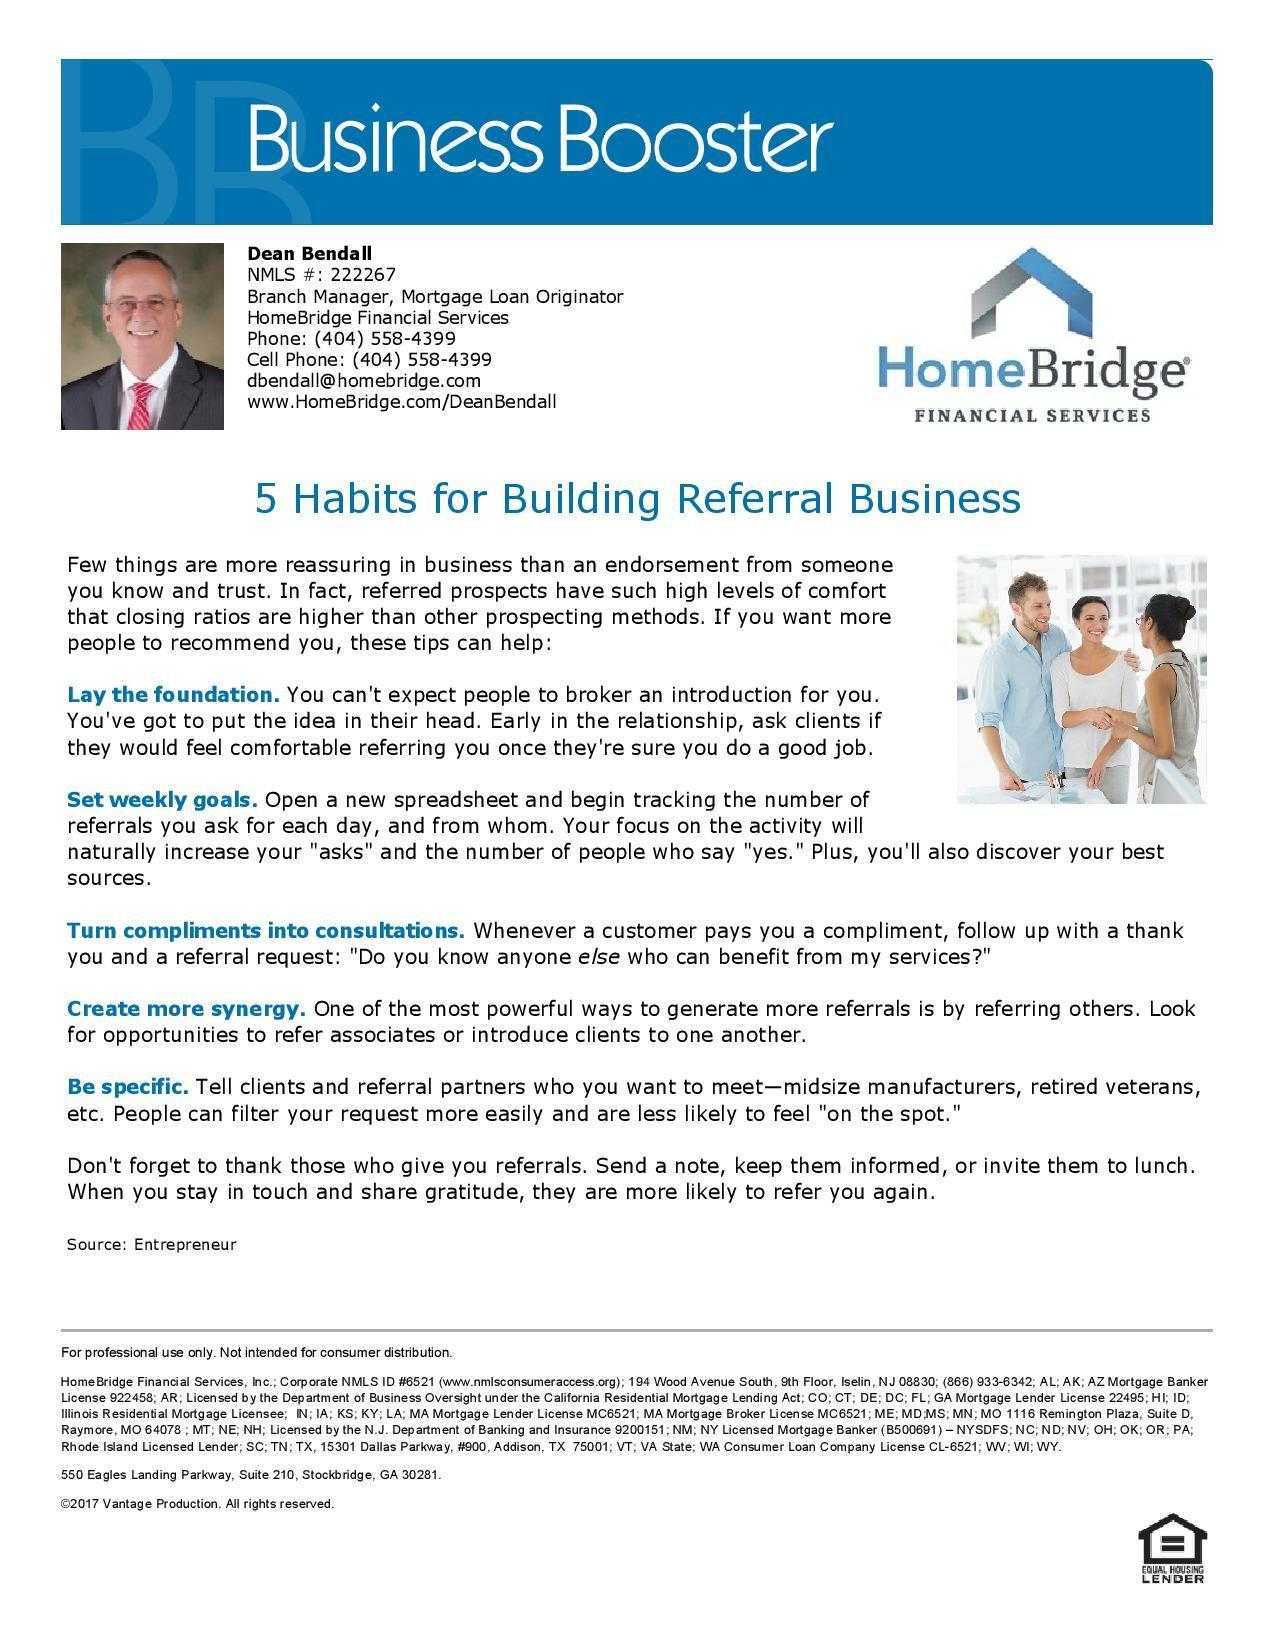 Dean Bendall Mortgage Loans Mortgage Loan Originator Refinance